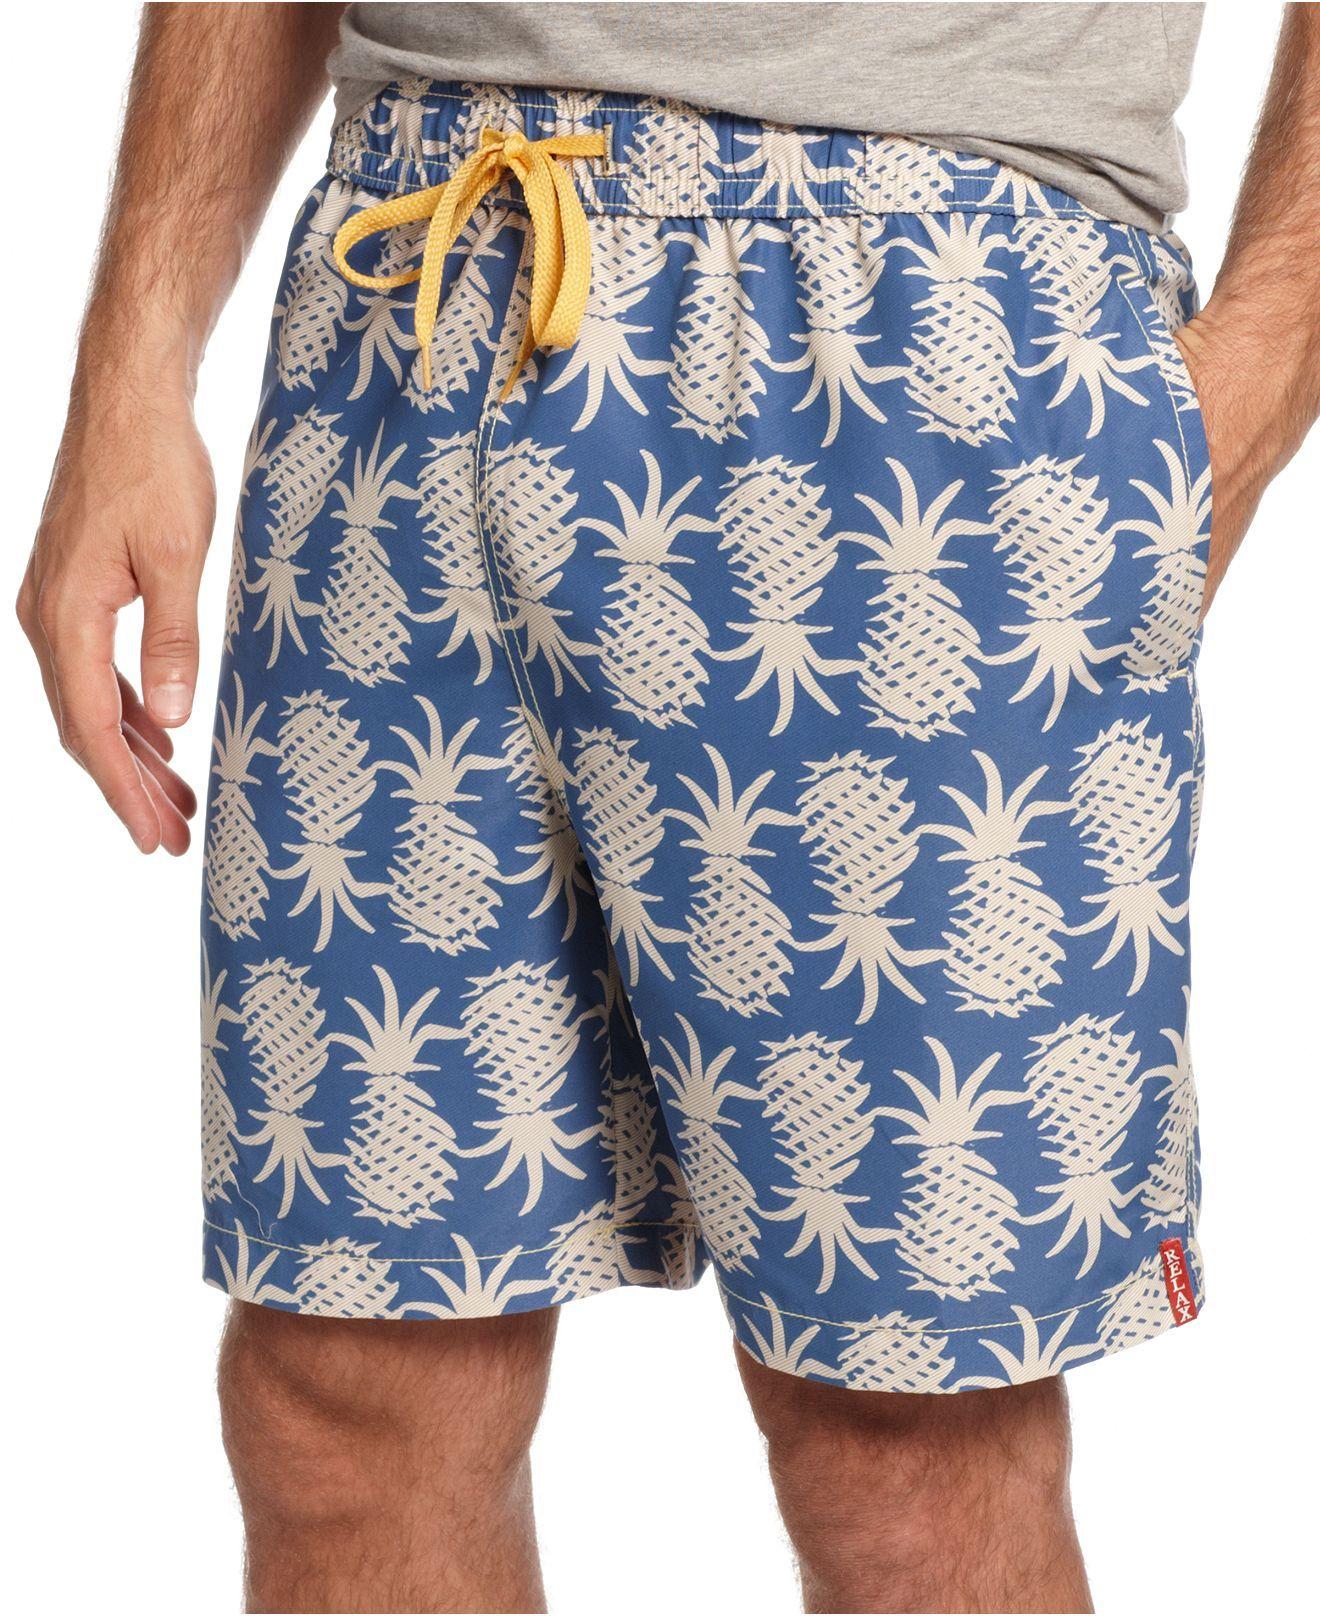 0d80259c6c7988 Tommy Bahama Swimwear, Pineapple Upside Down Trunks - Mens Swim - Macy's